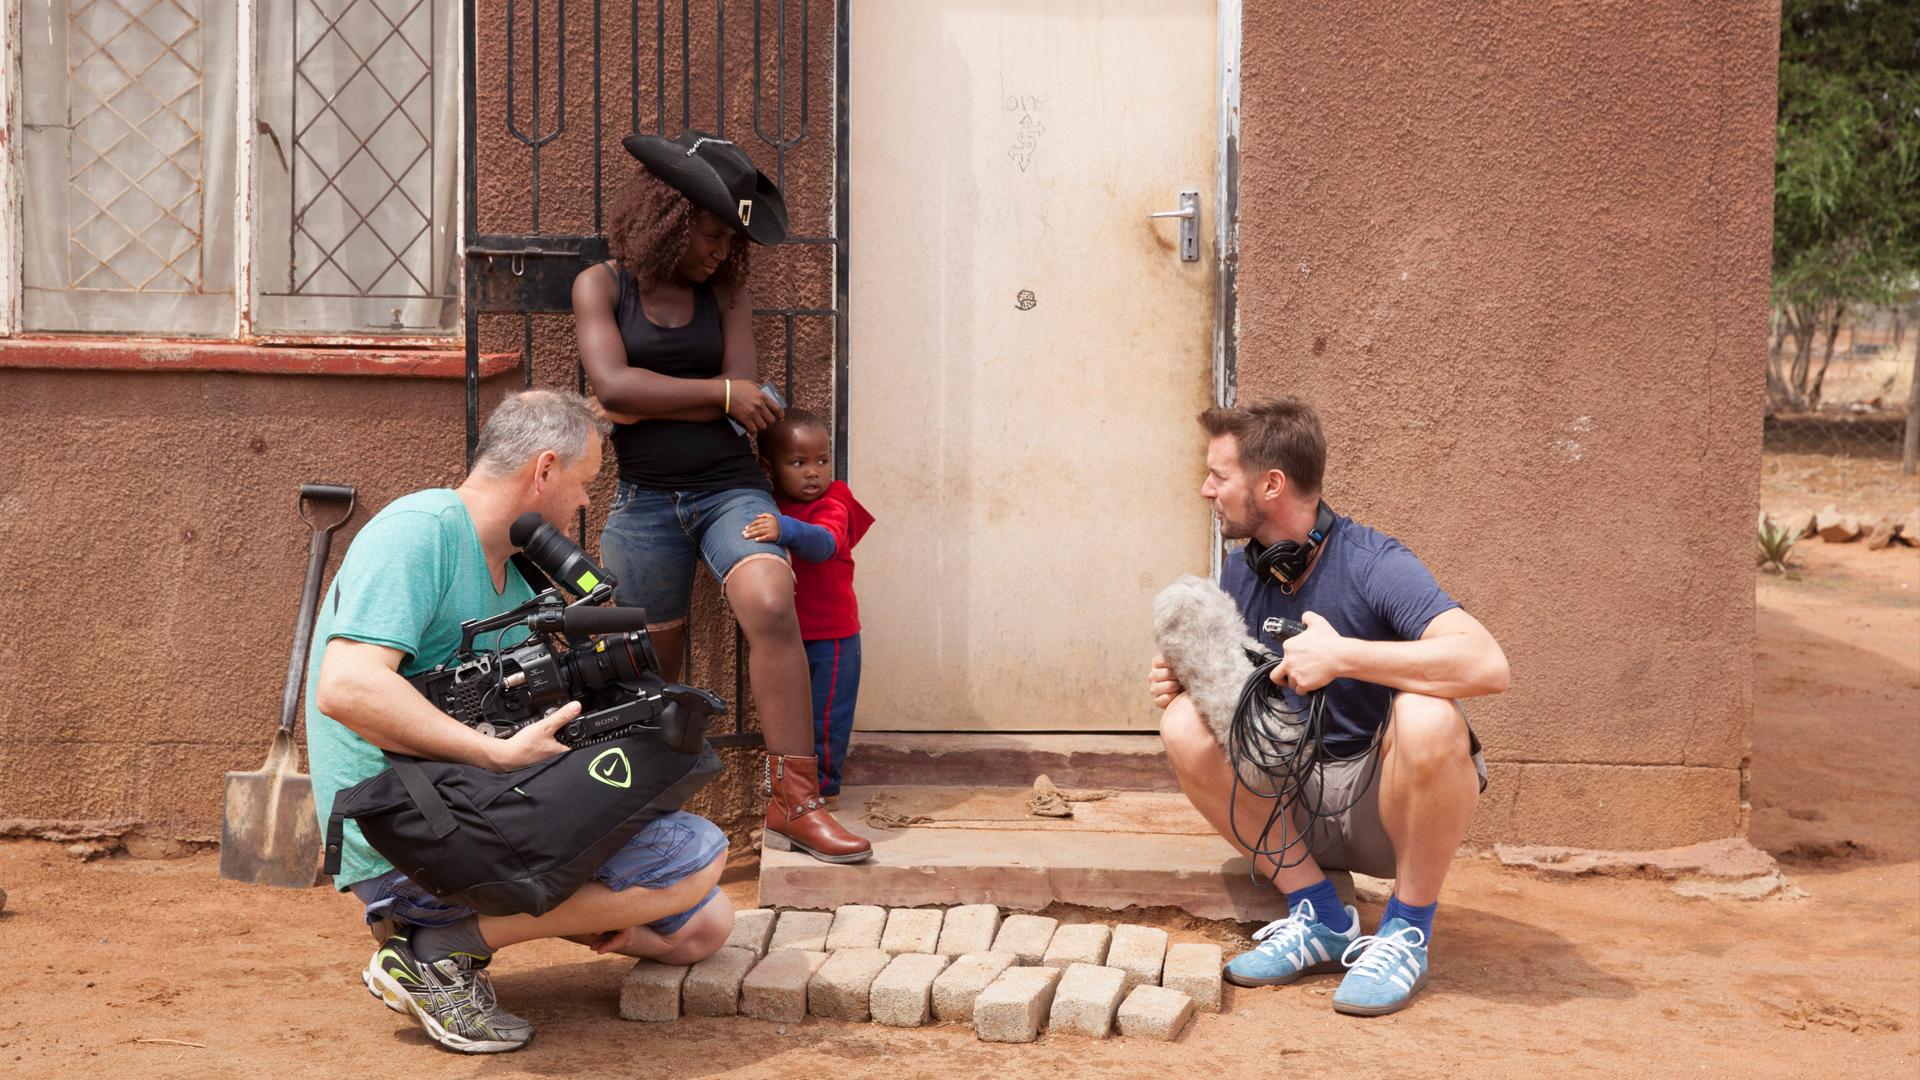 Arte Documentary - Queens of Botswana - Making of Image 13